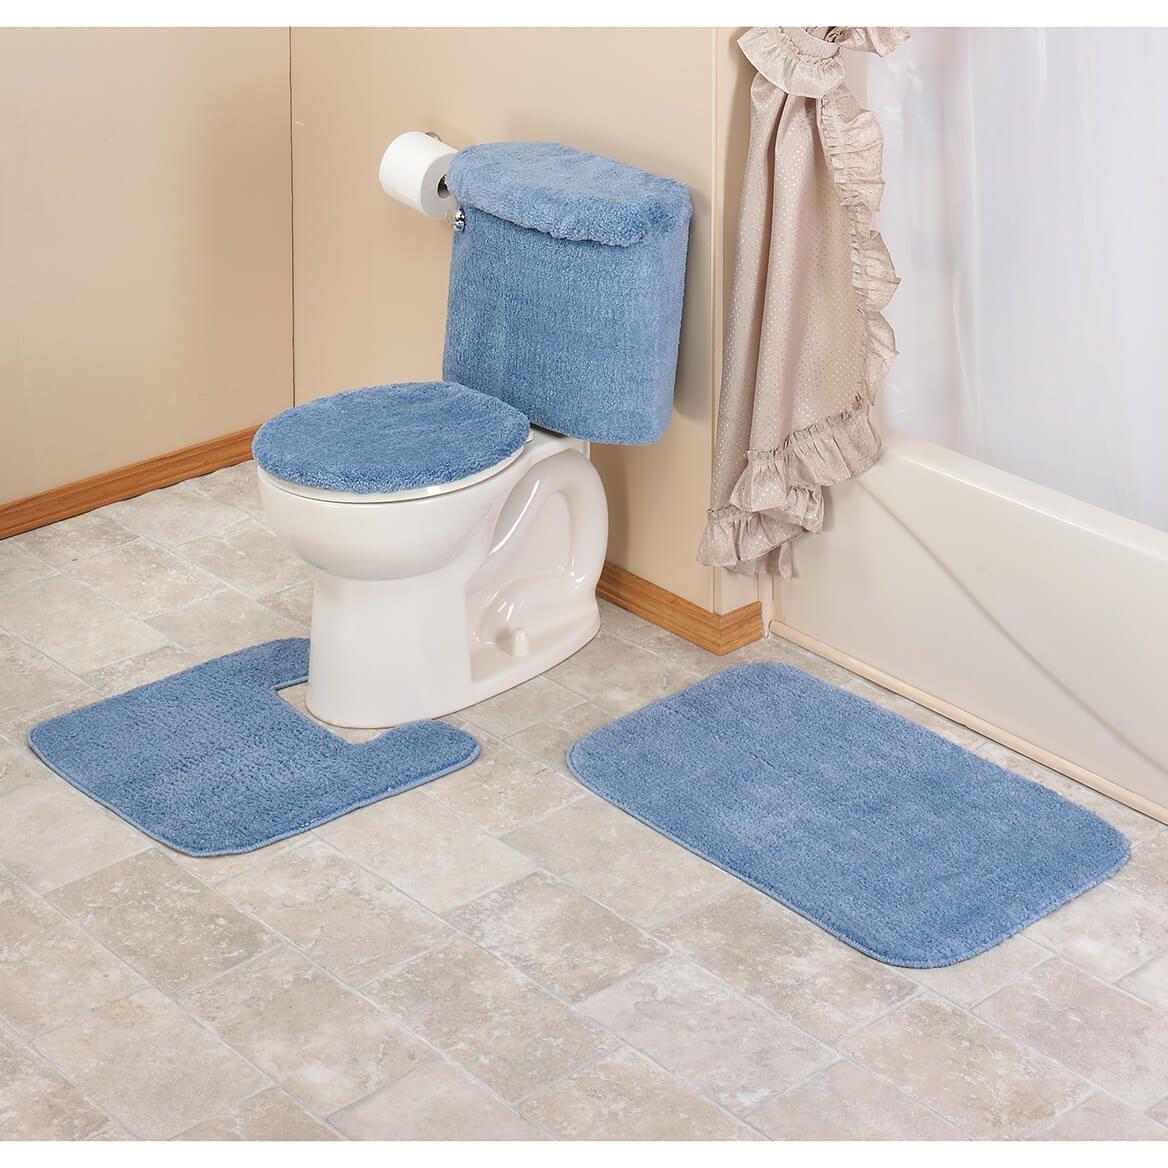 5 Piece Bath Set-328385